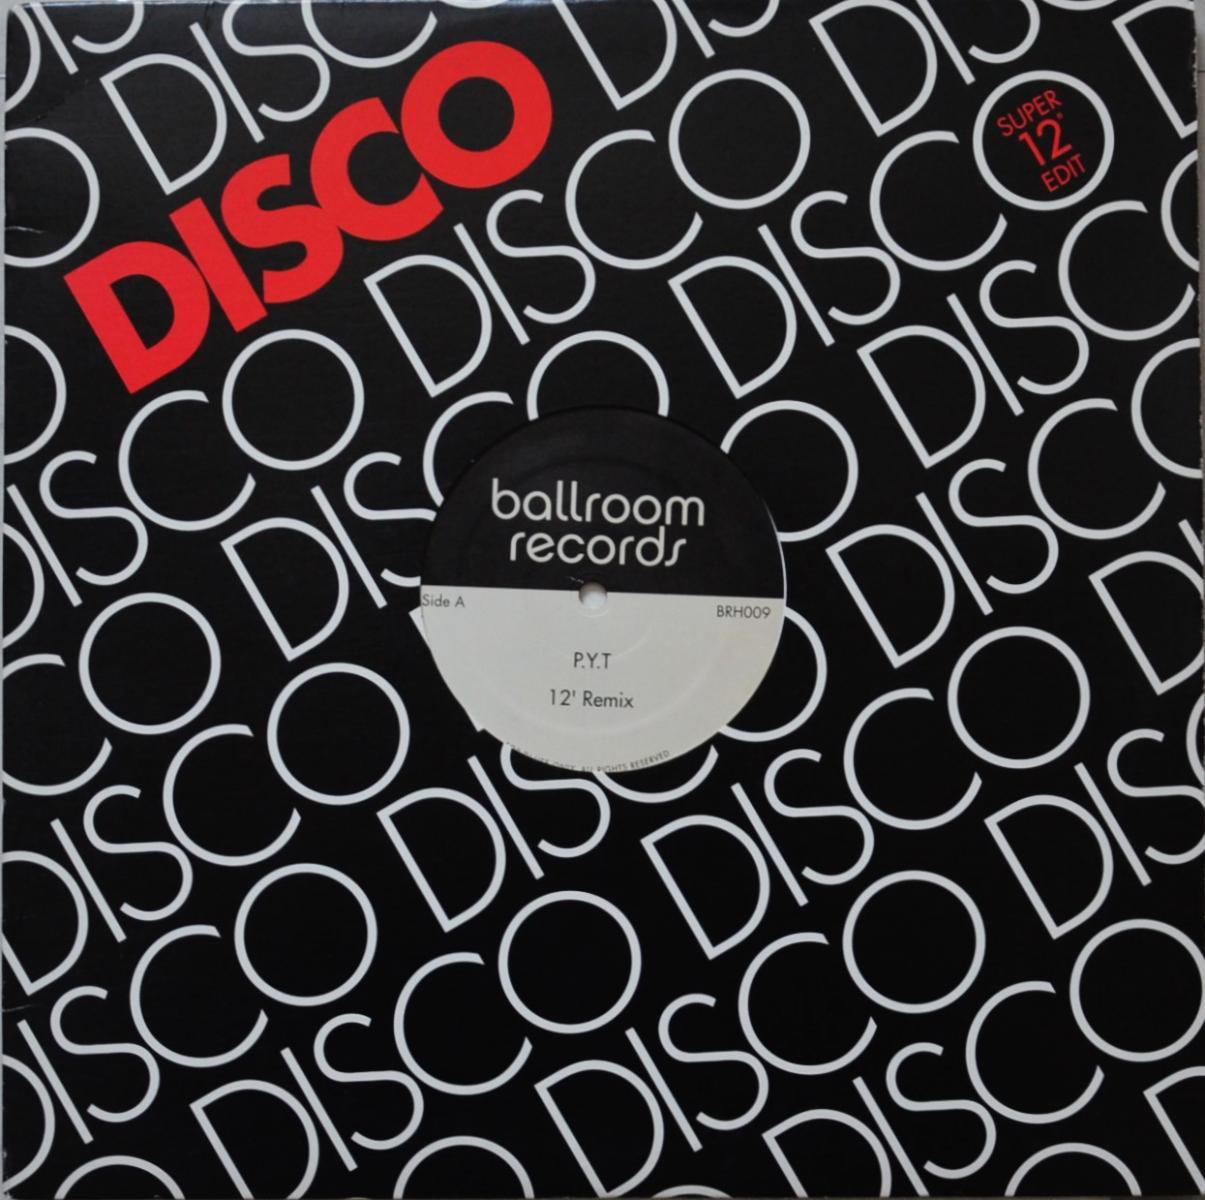 MICHAEL JACKSON / DRUMS POWER / P.Y.T / DANCE RITUAL (12